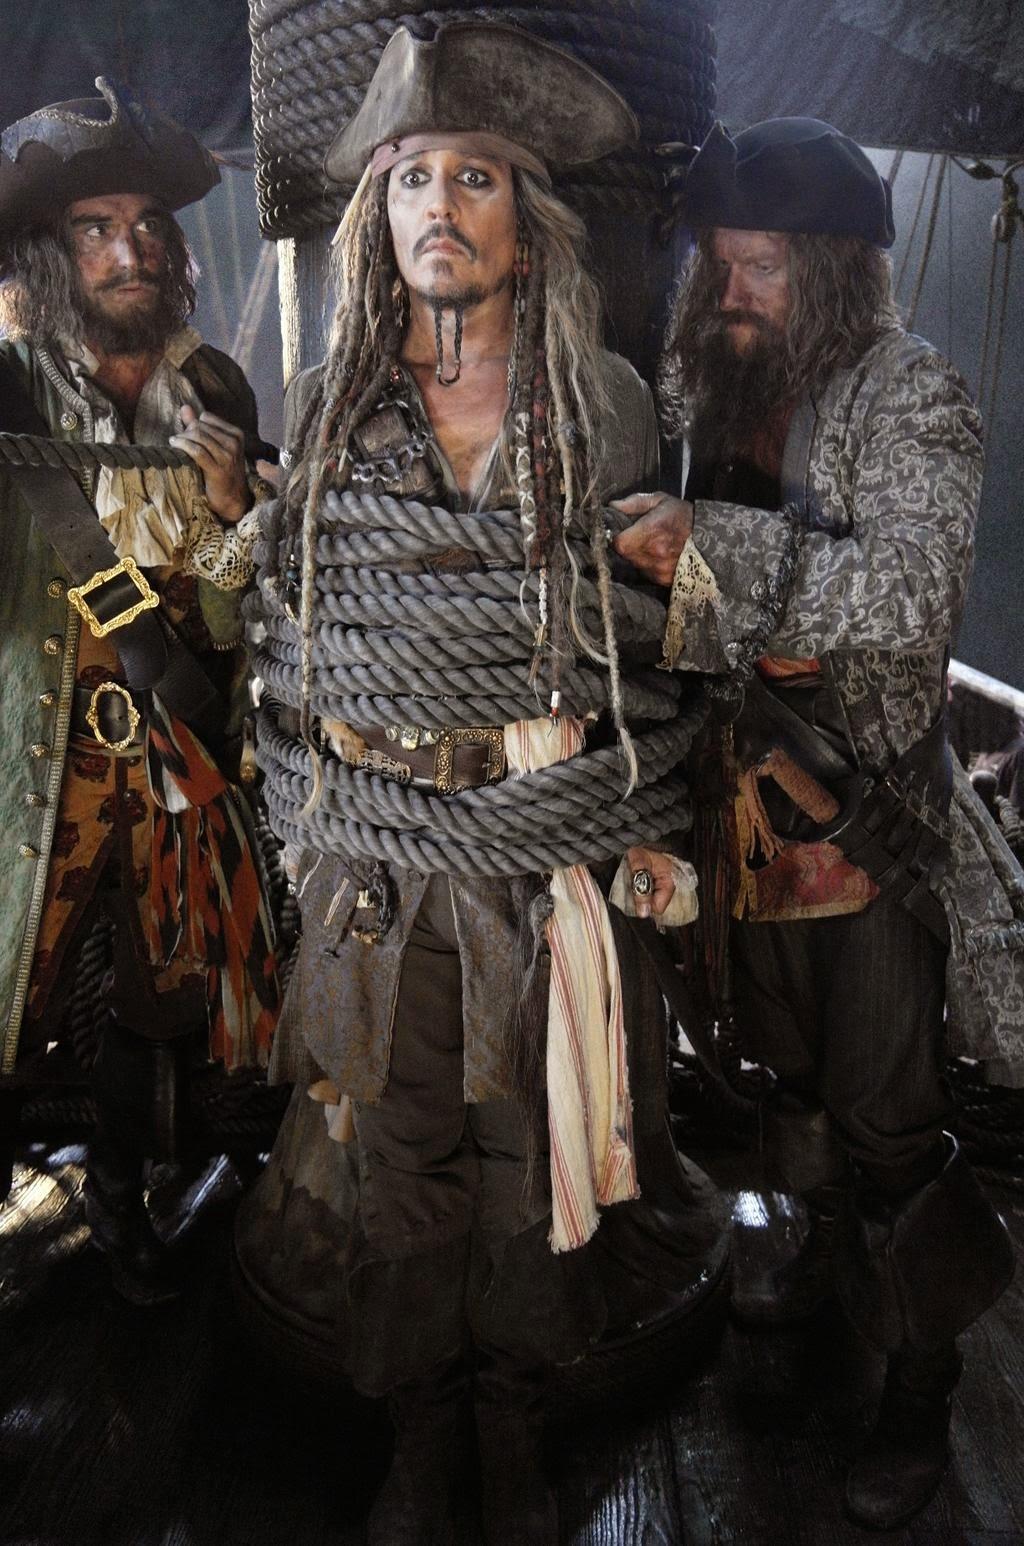 captain jack sparrow pirates of the caribbean 5 dead men tell no